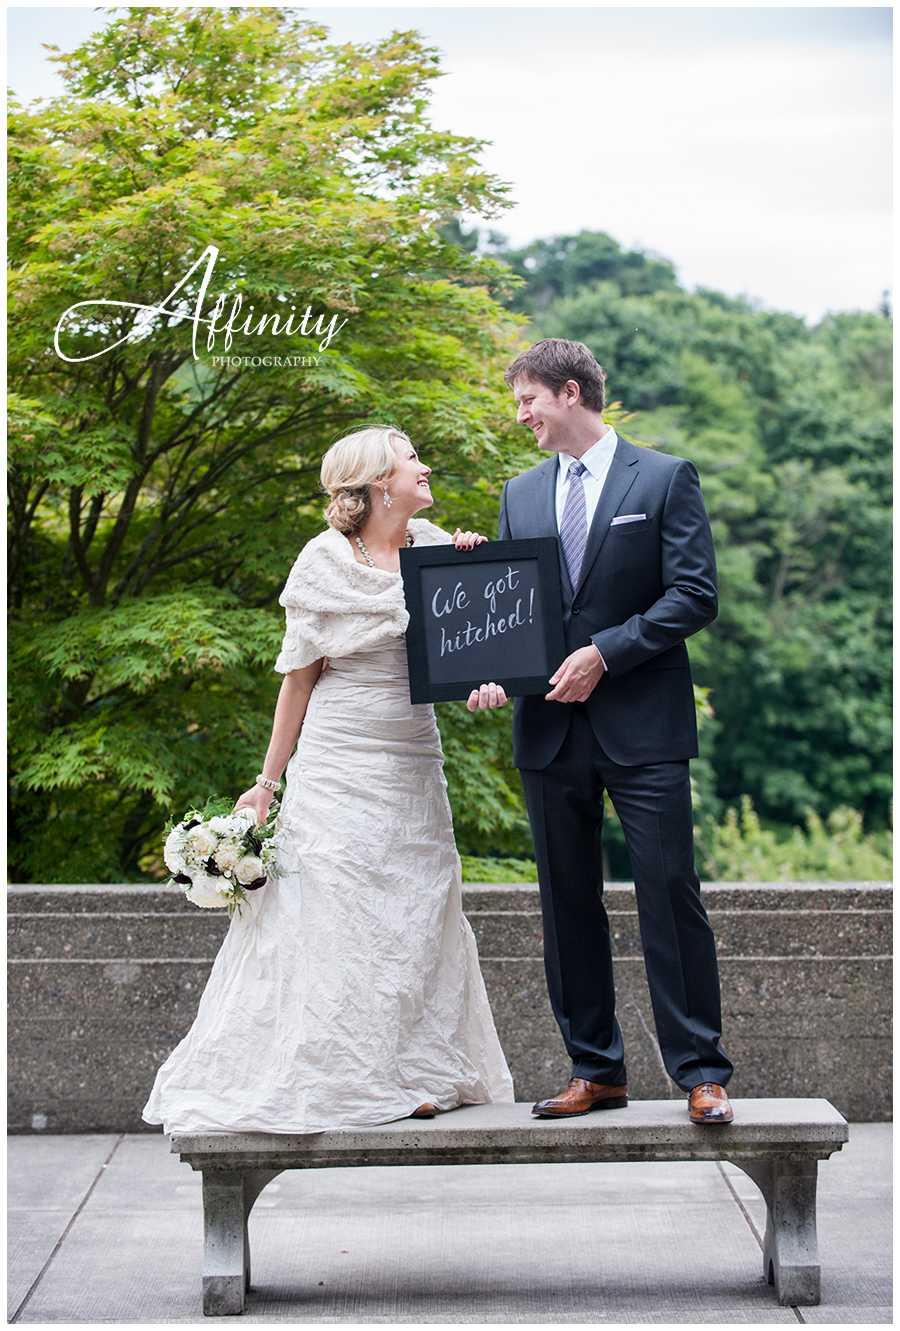 09-we-got-hitched-chalkboard-sign.jpg